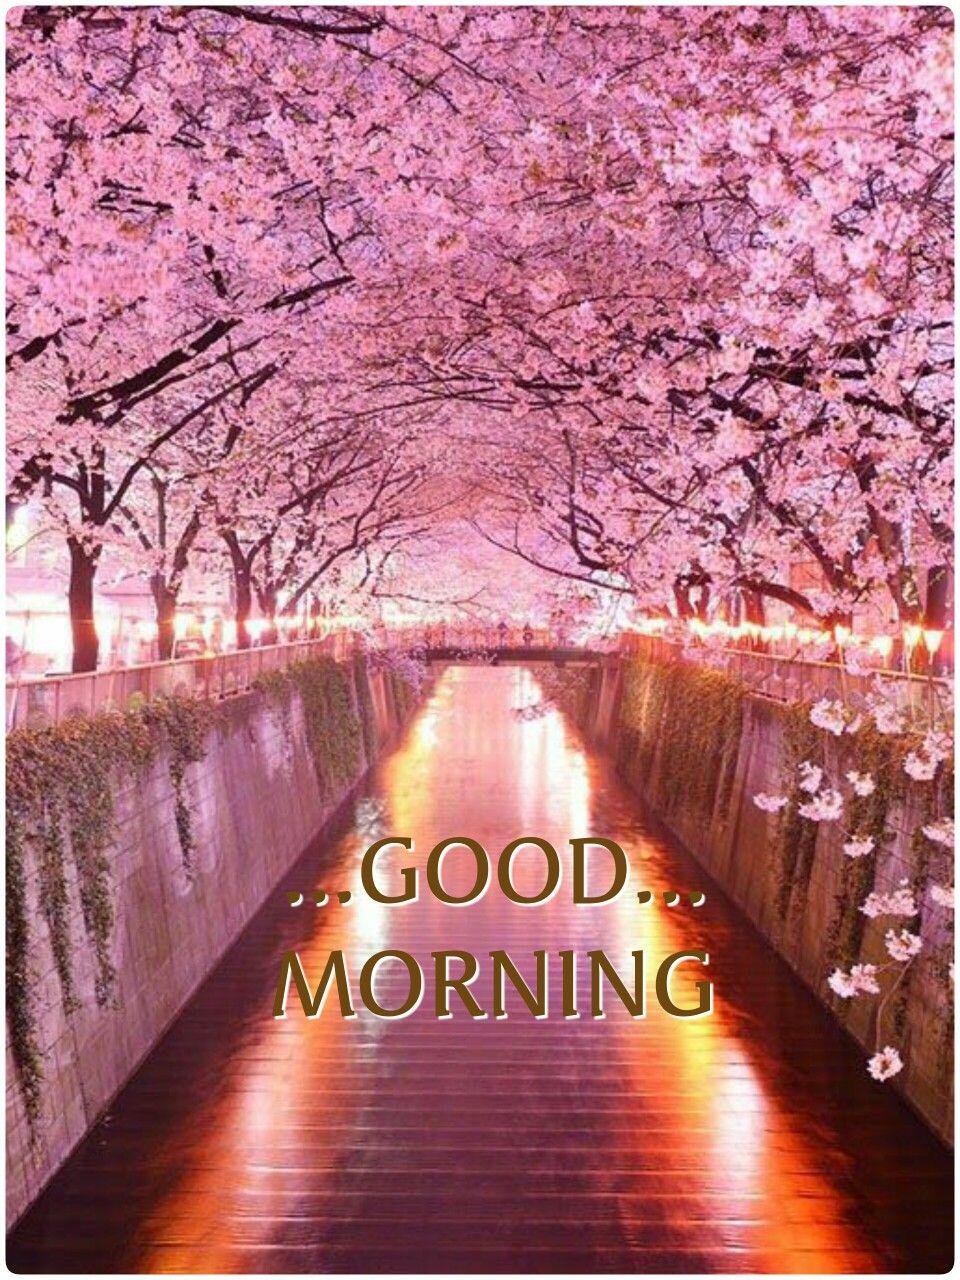 Pin By Pinku On Good Morning Good Morning Beautiful Pictures Good Morning Nature Good Morning Greeting Cards